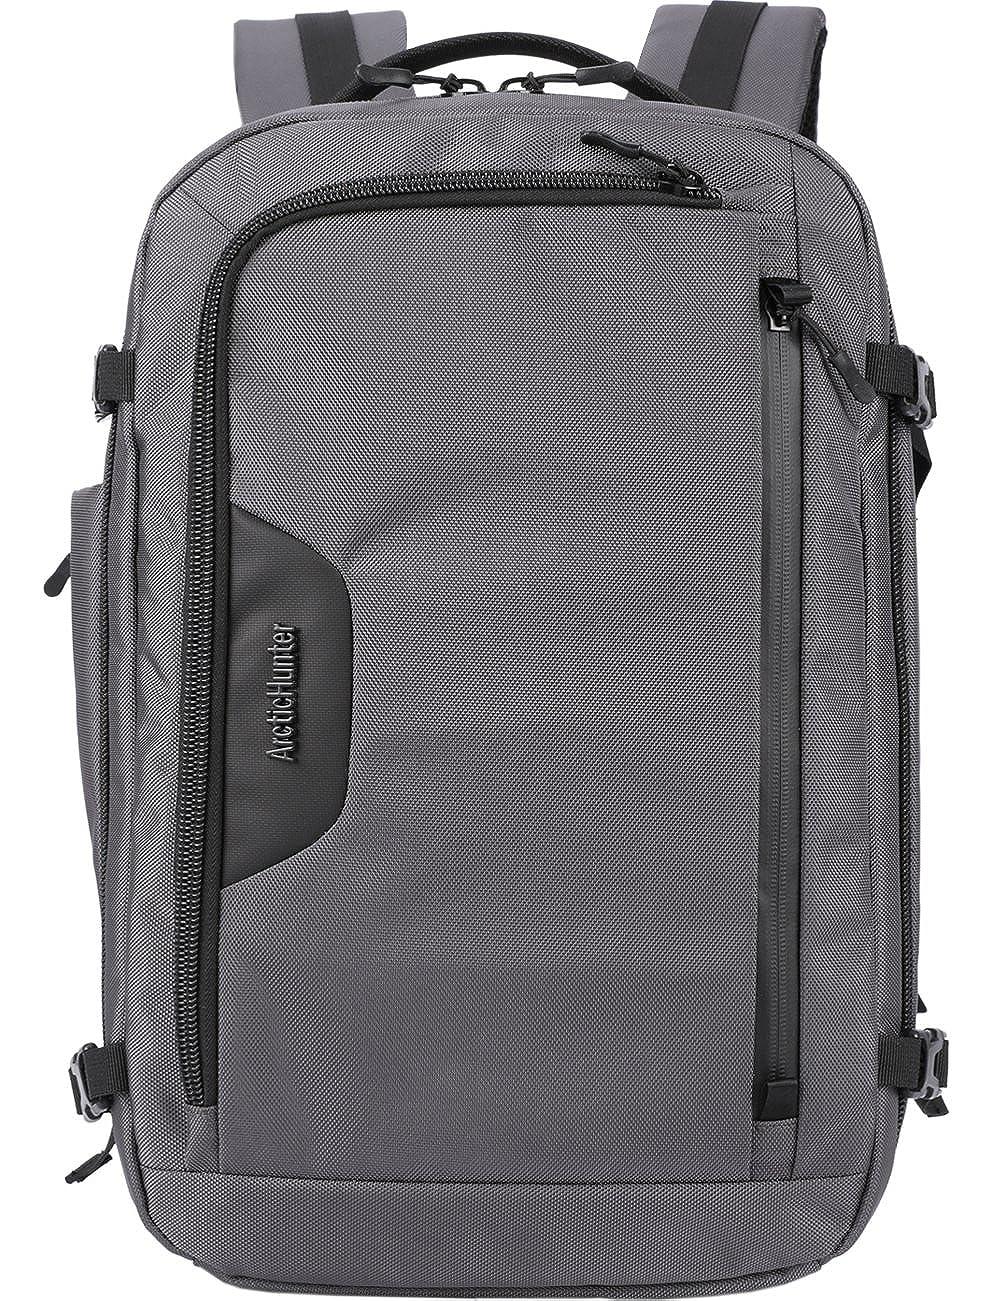 Mygreen Convertible Laptop Messenger Bag Backpack Rucksack Briefcase School Bookbag